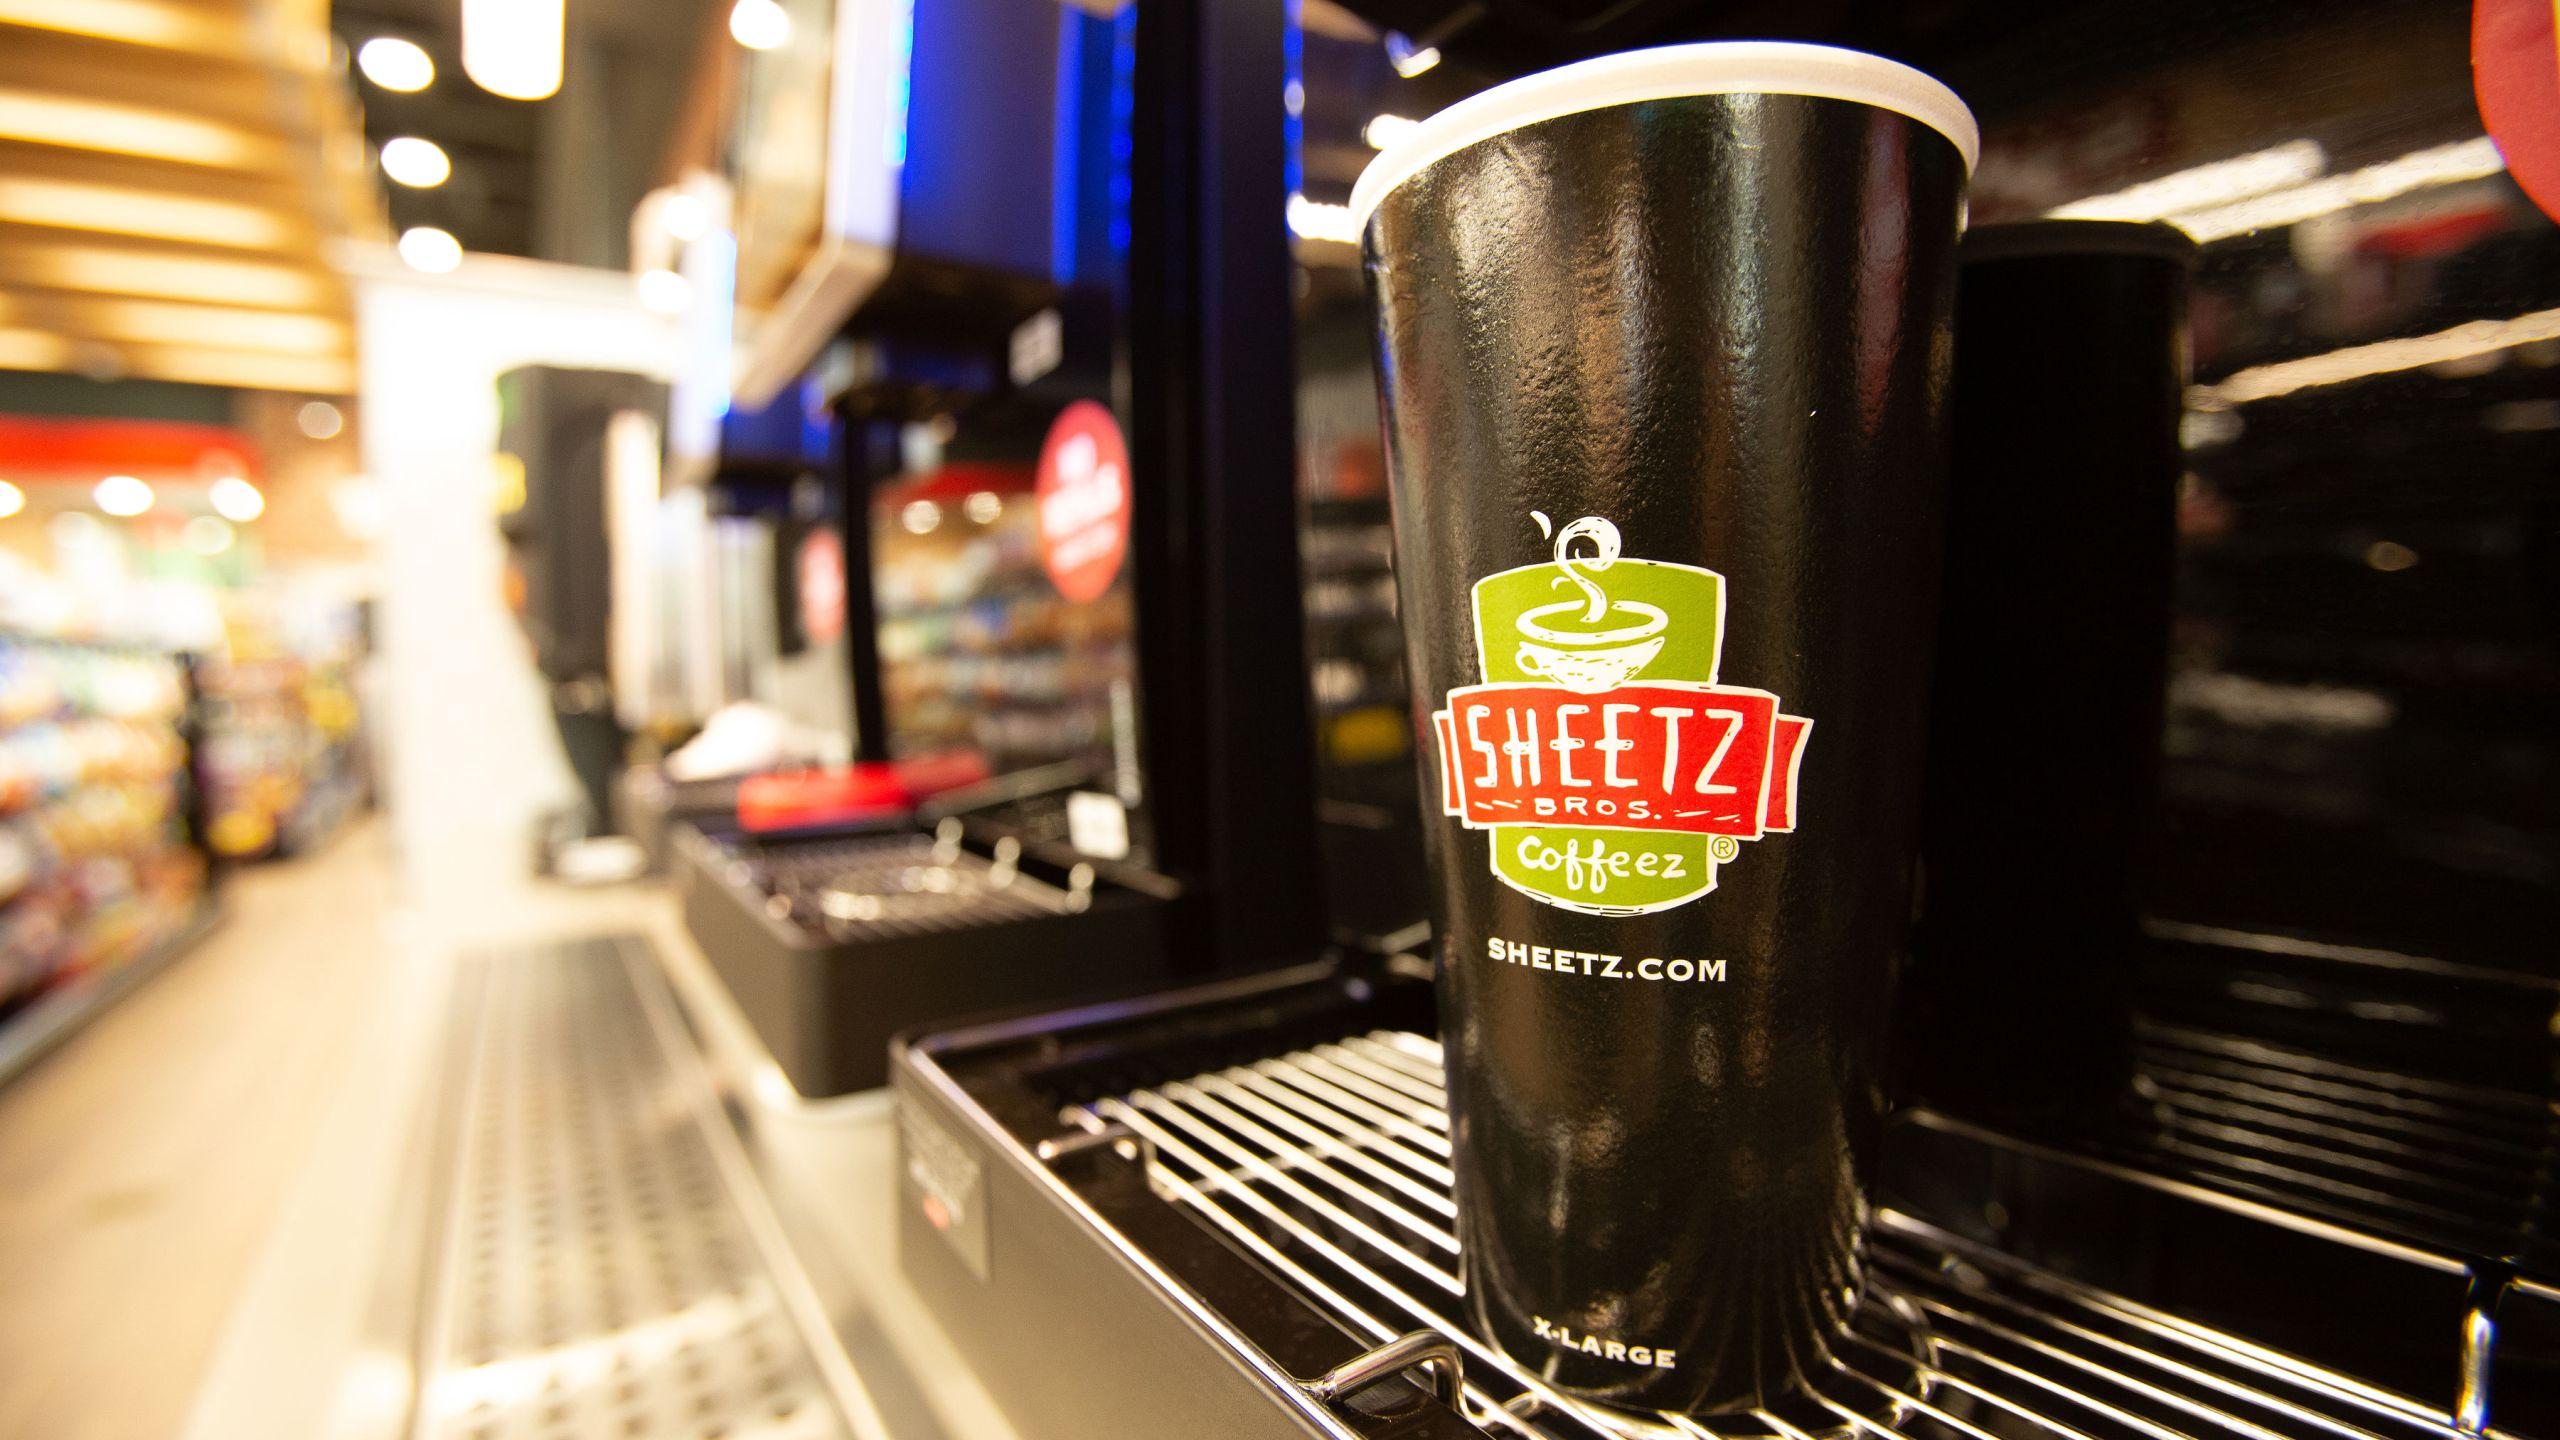 Sheetz self serve coffee